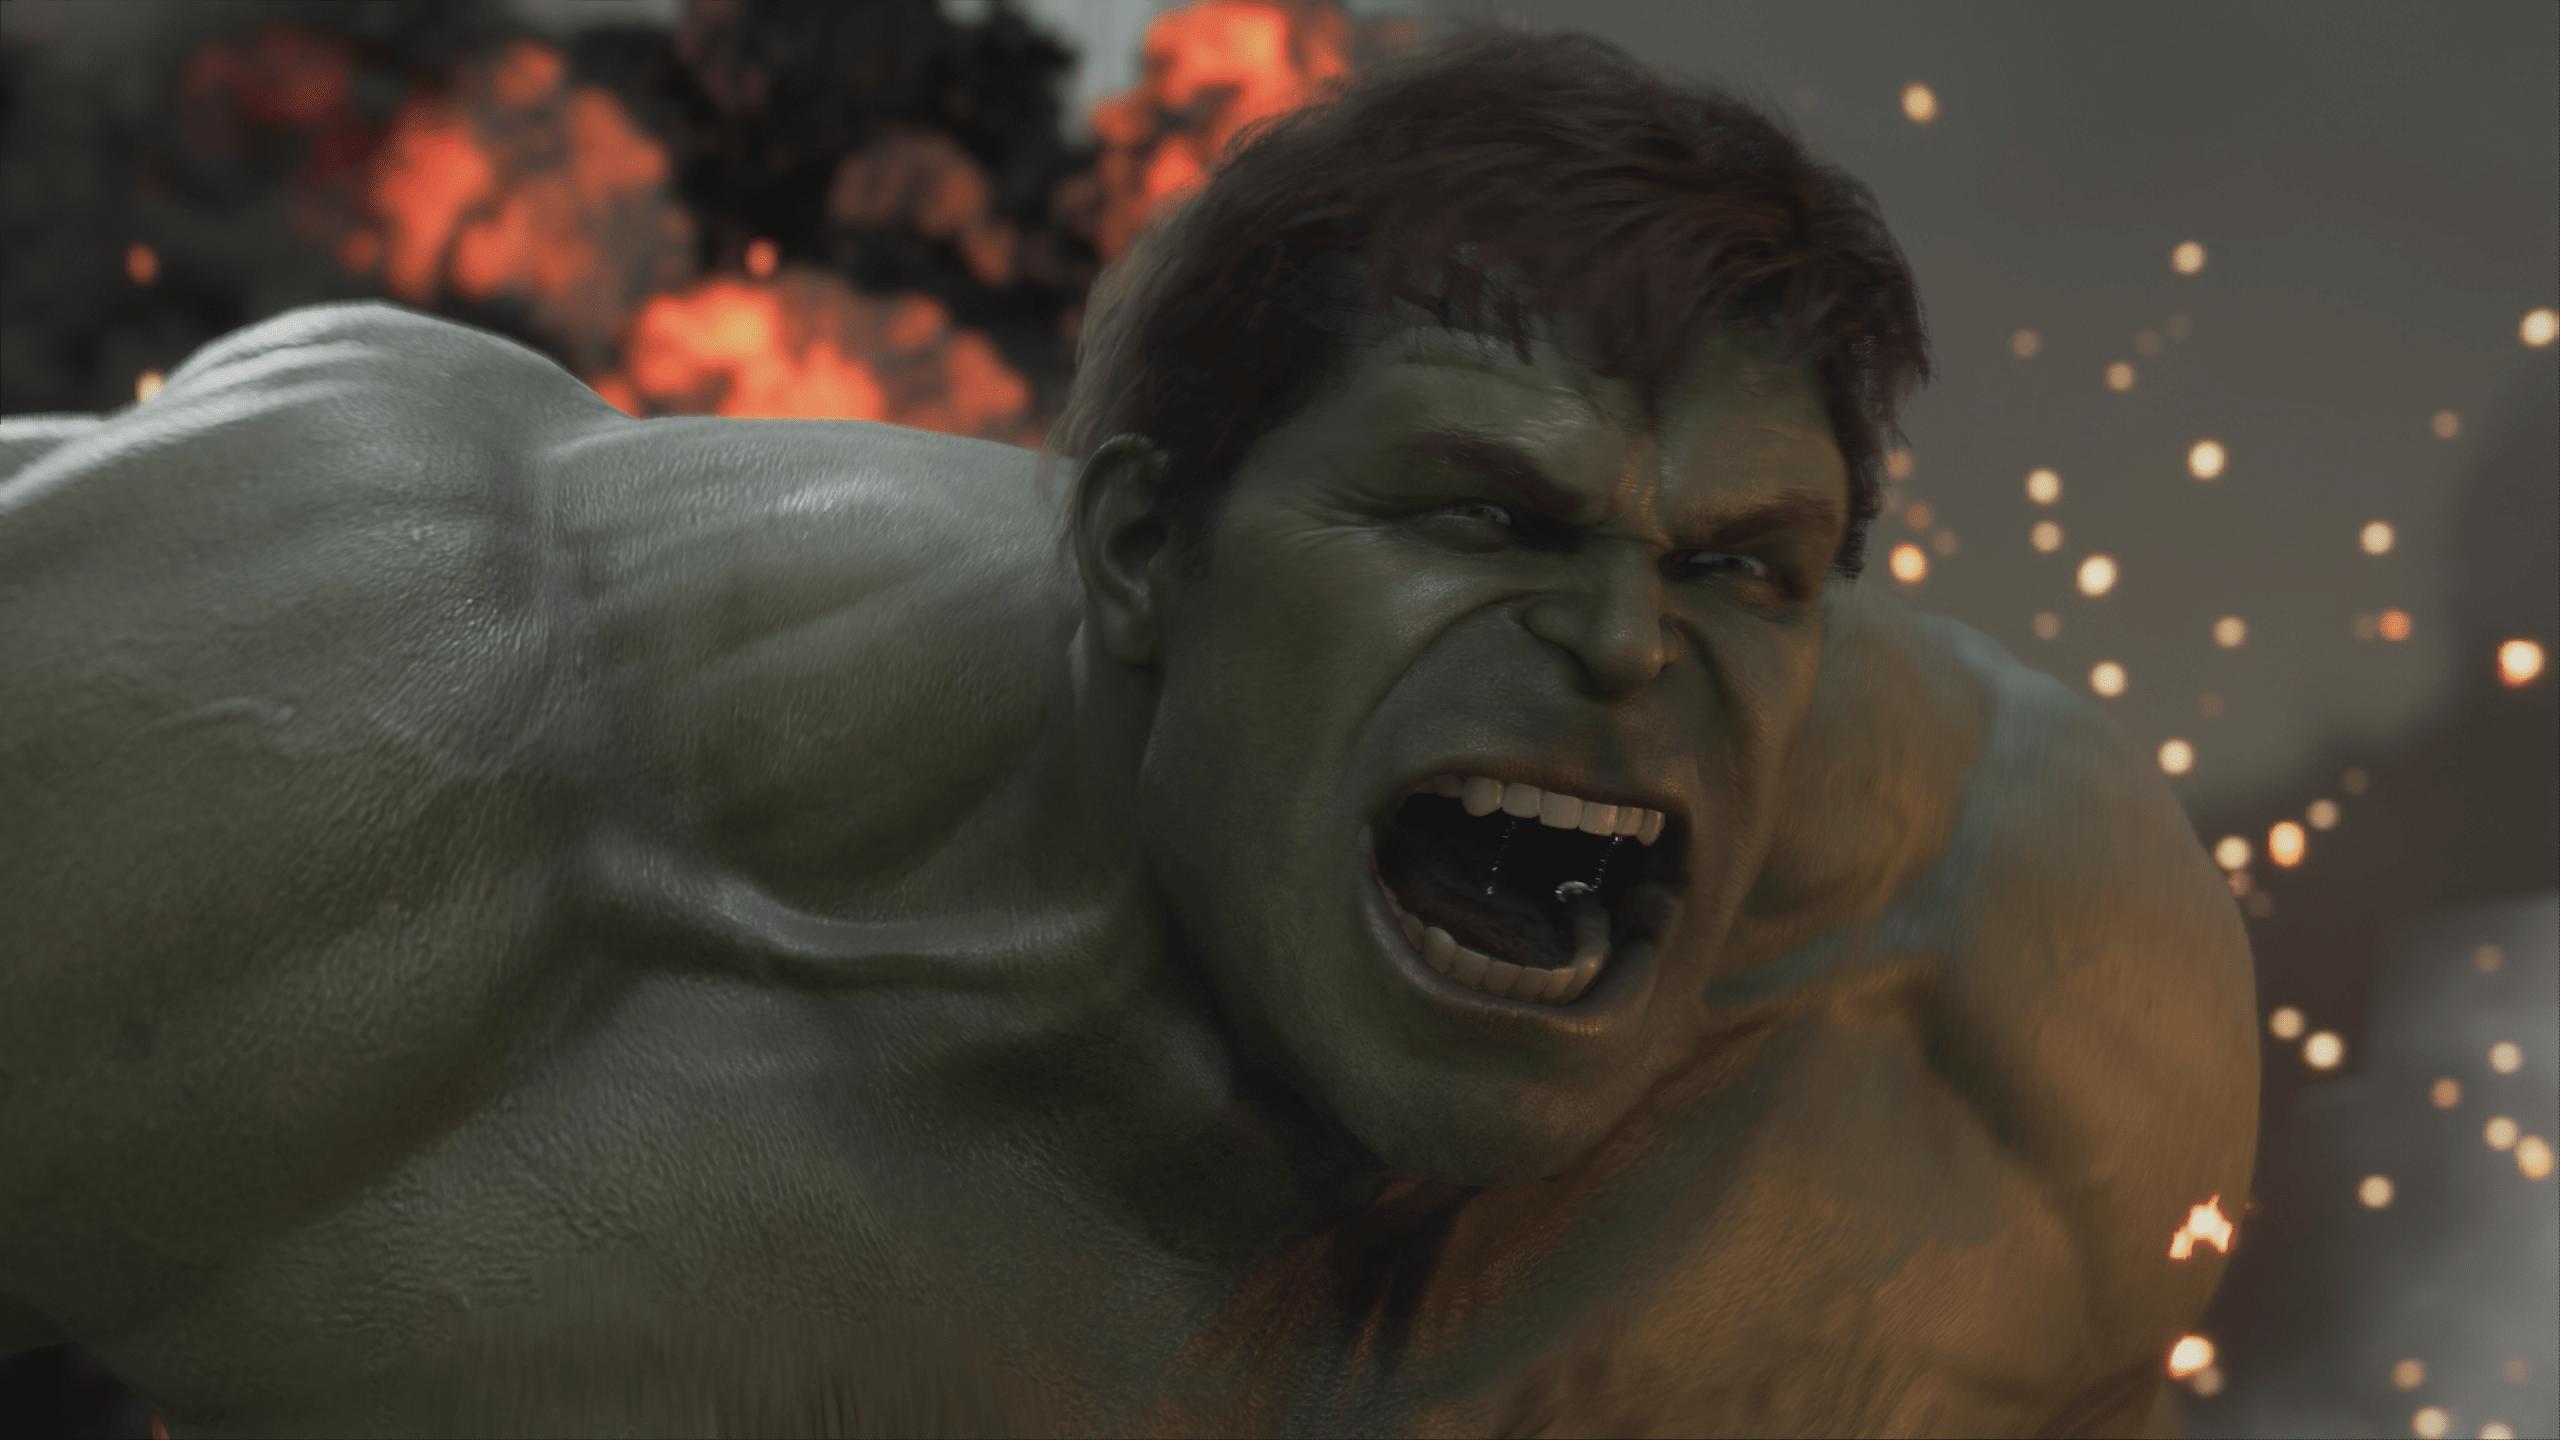 موعد إفتتاح بيتا Marvel's Avengers